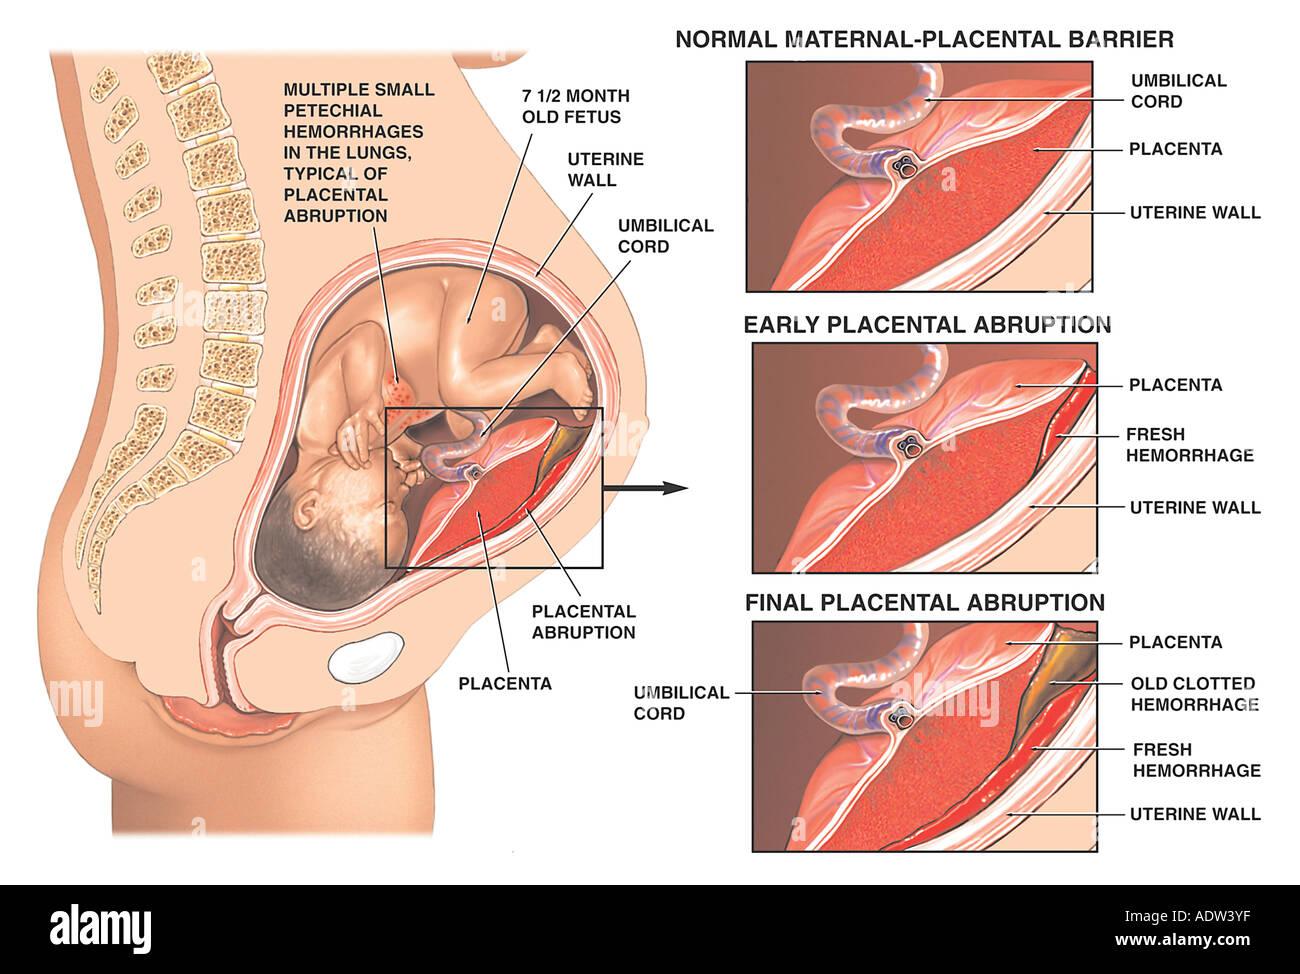 Post-traumatic Placental Abruption - Stock Image